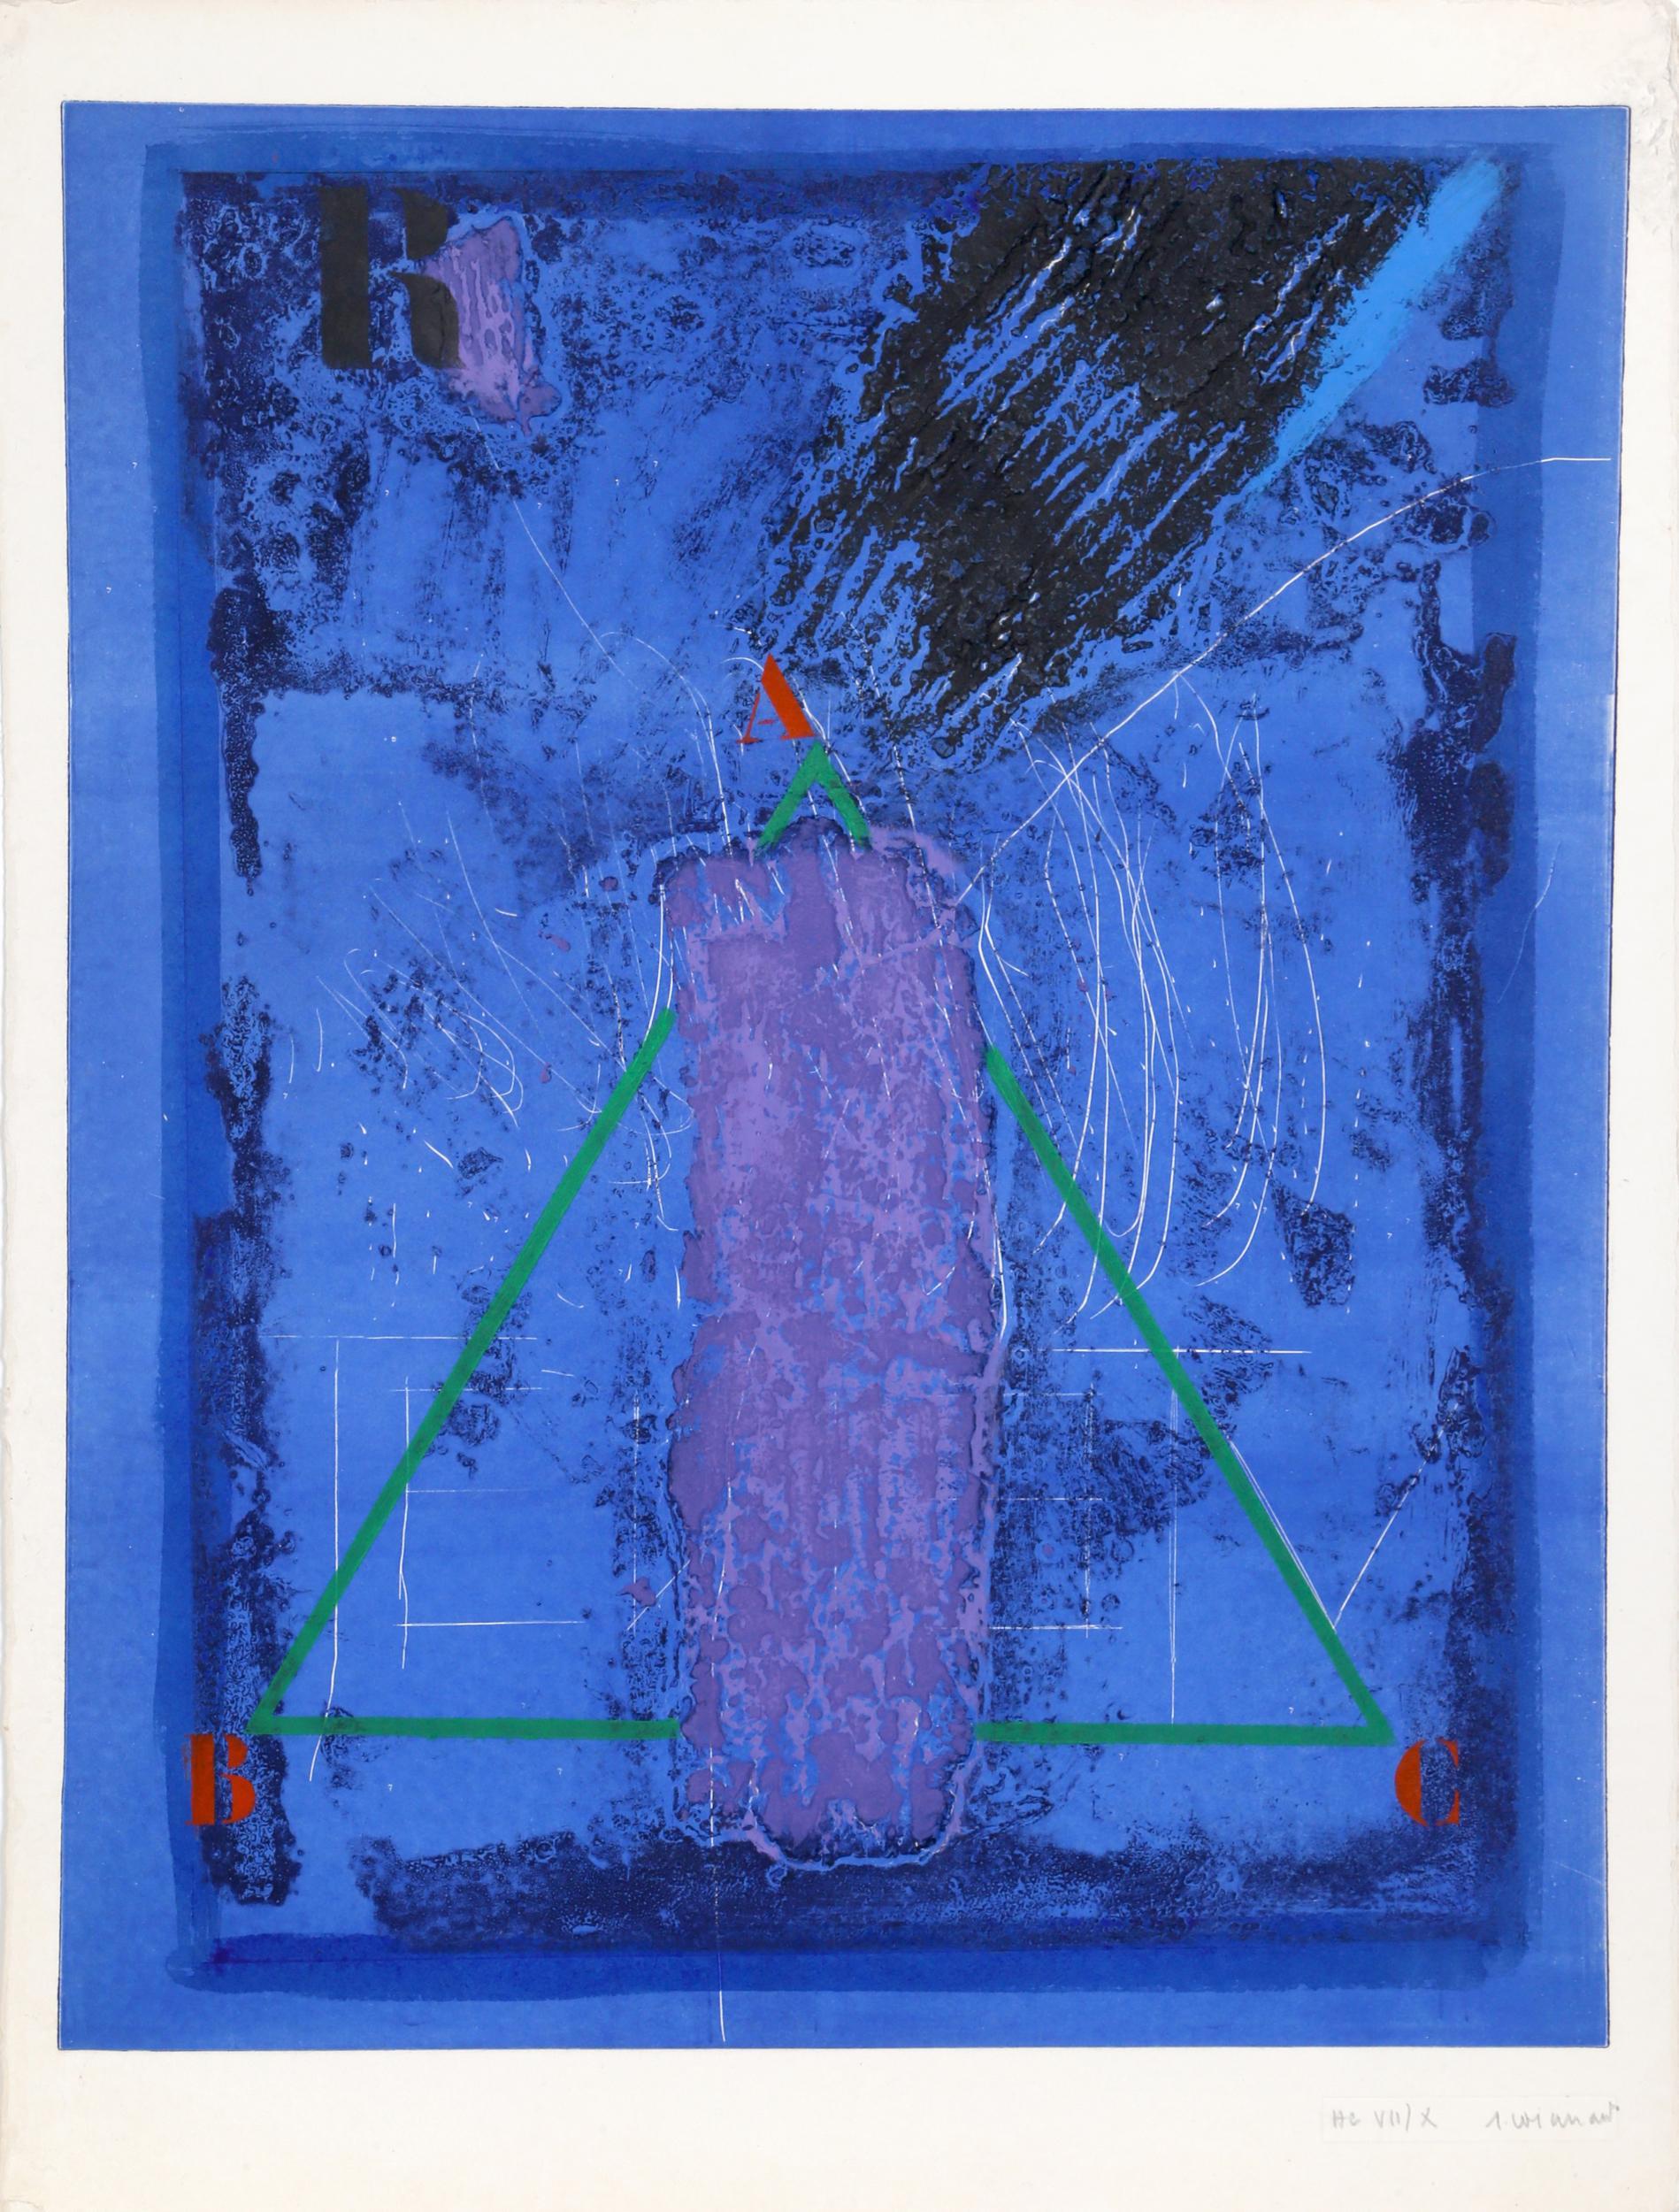 James Coignard, Purple Form, Carborundum Etching